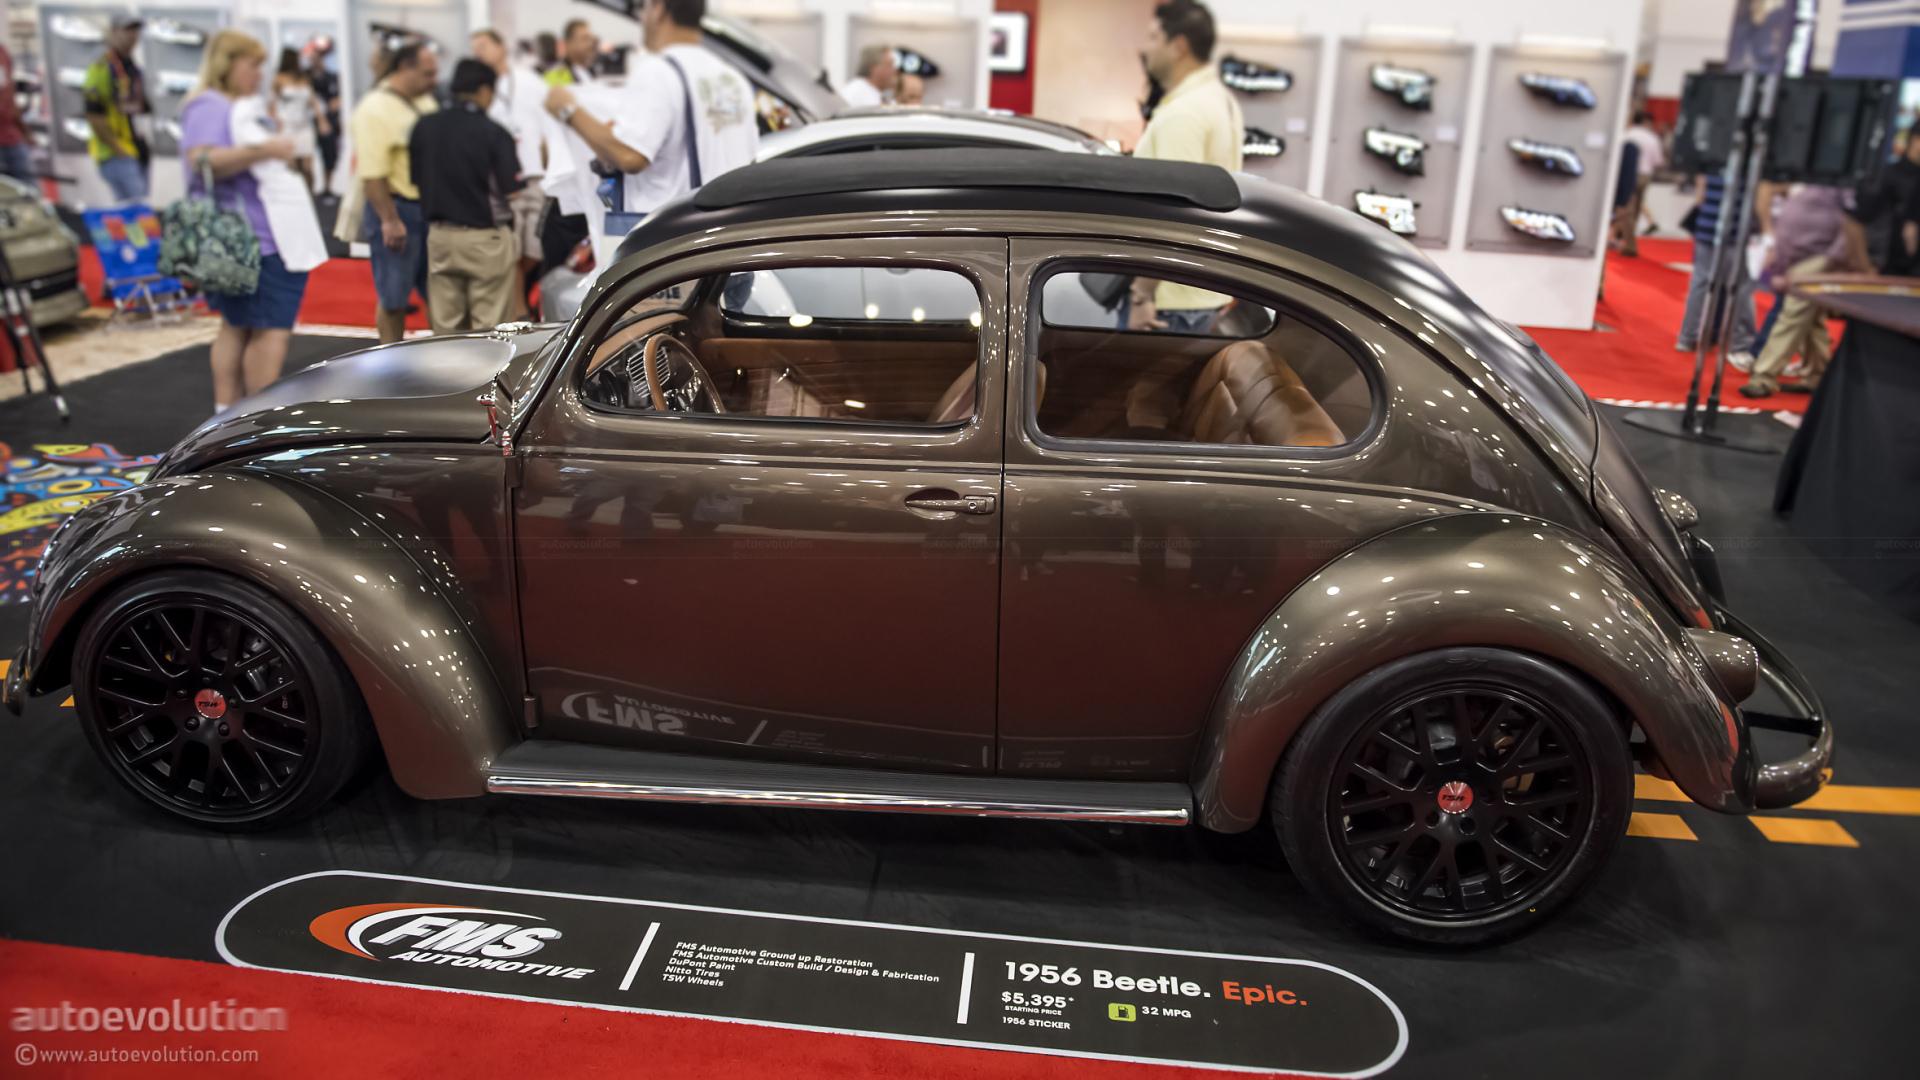 2012 SEMA: 1956 VW Beetle by FMS Automotive [Live Photos] - autoevolution